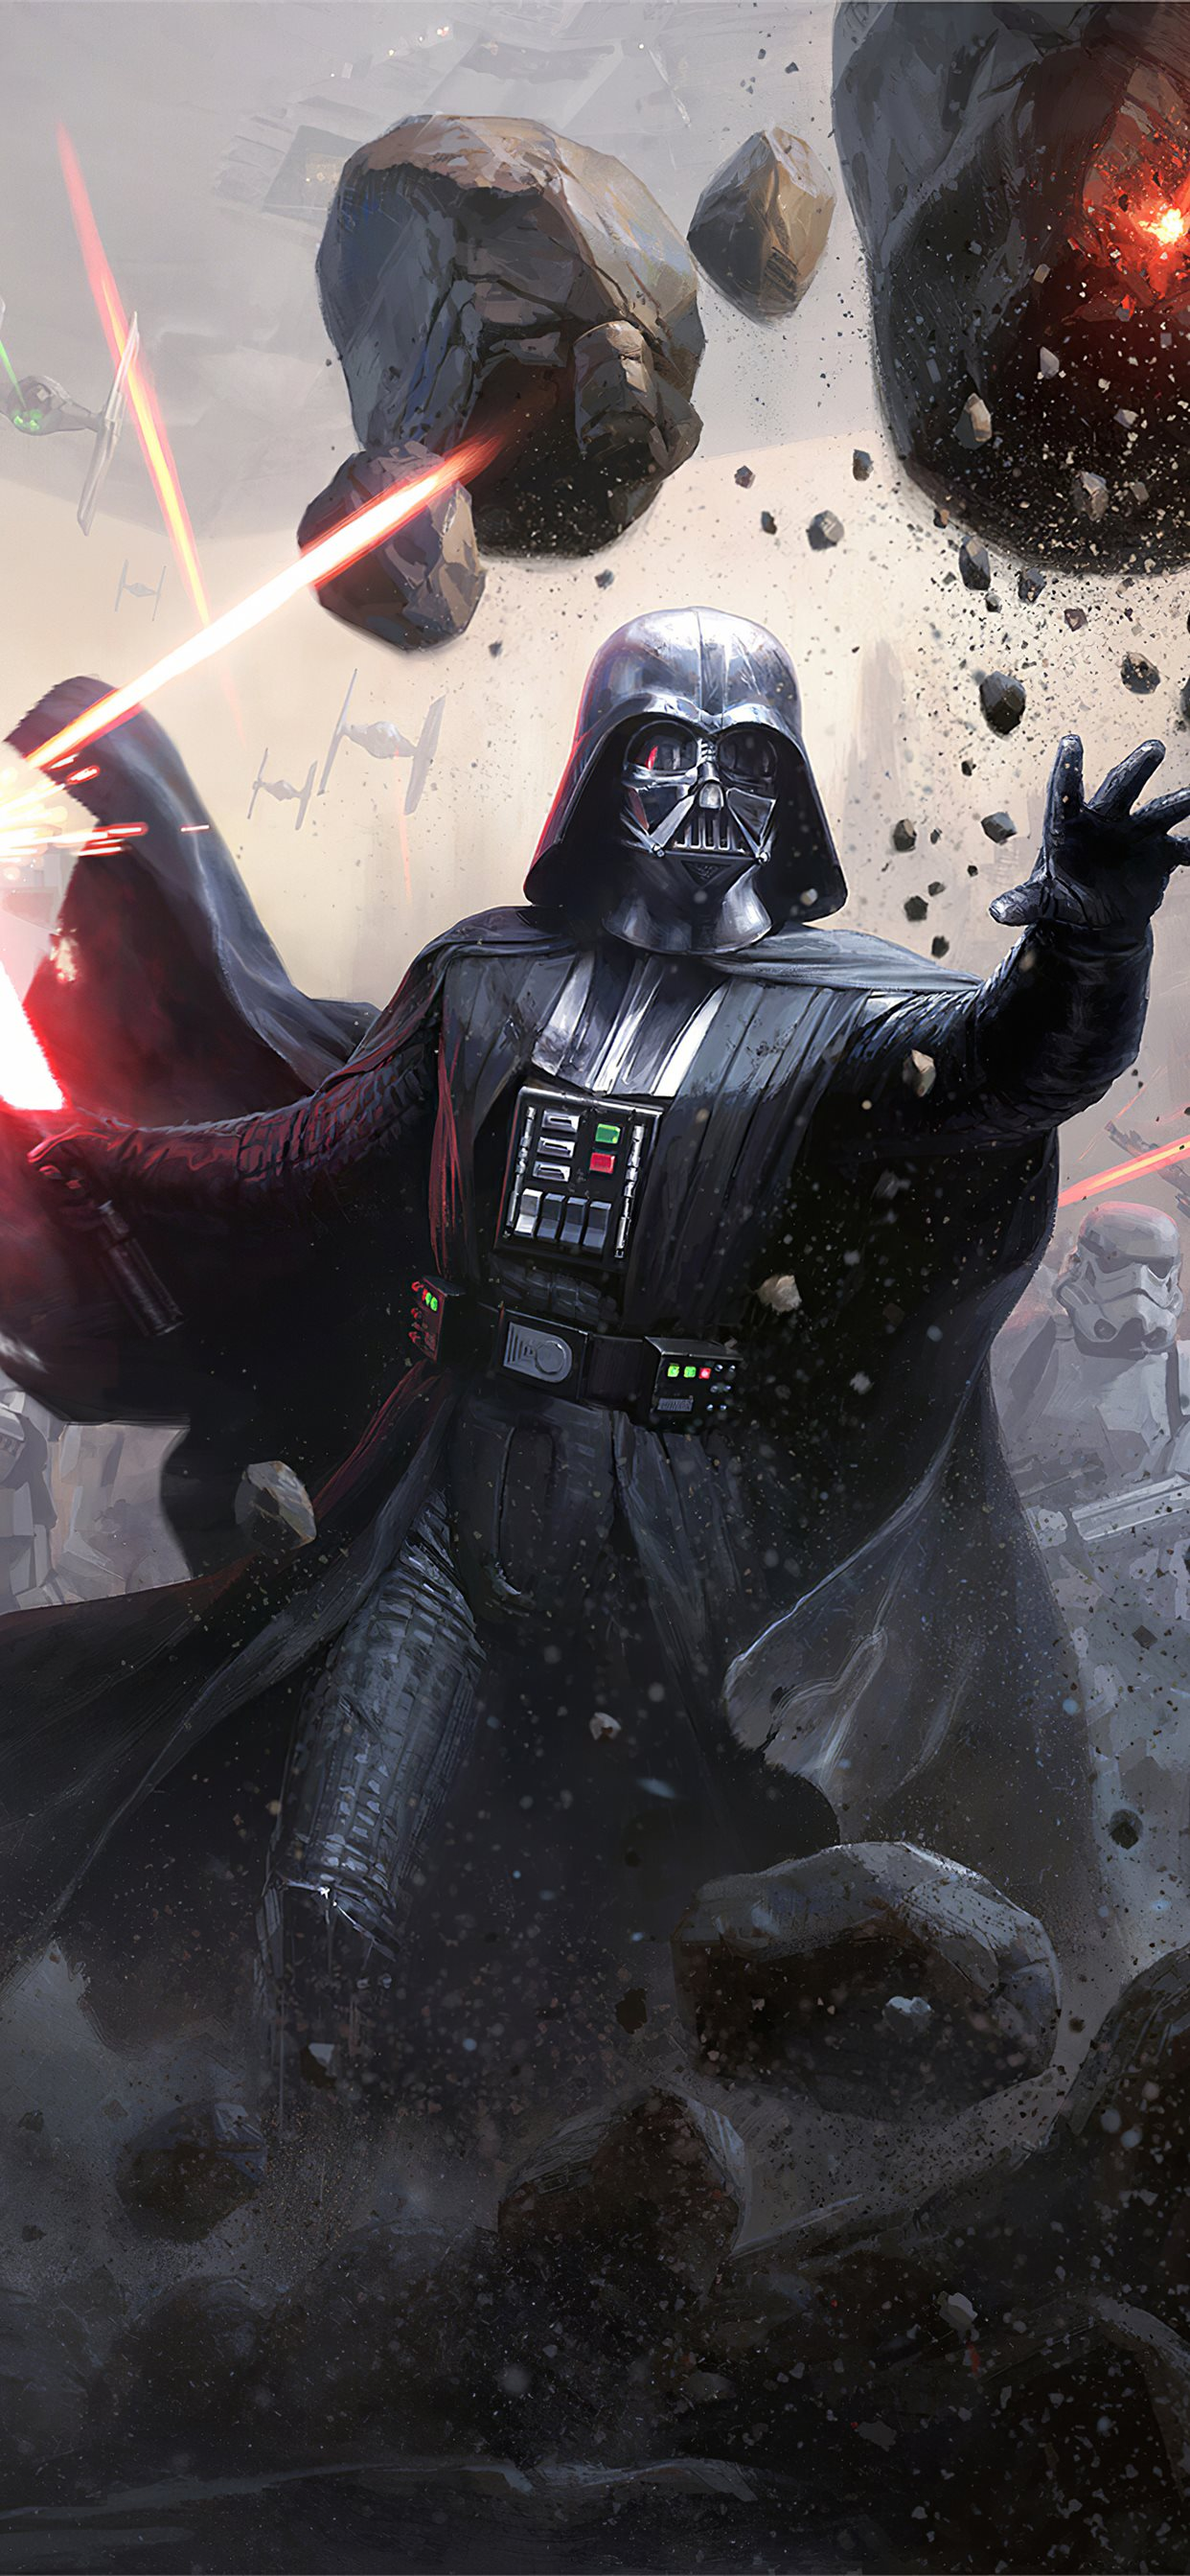 Darth Vader 4k 2020 Iphone X Wallpapers Free Download